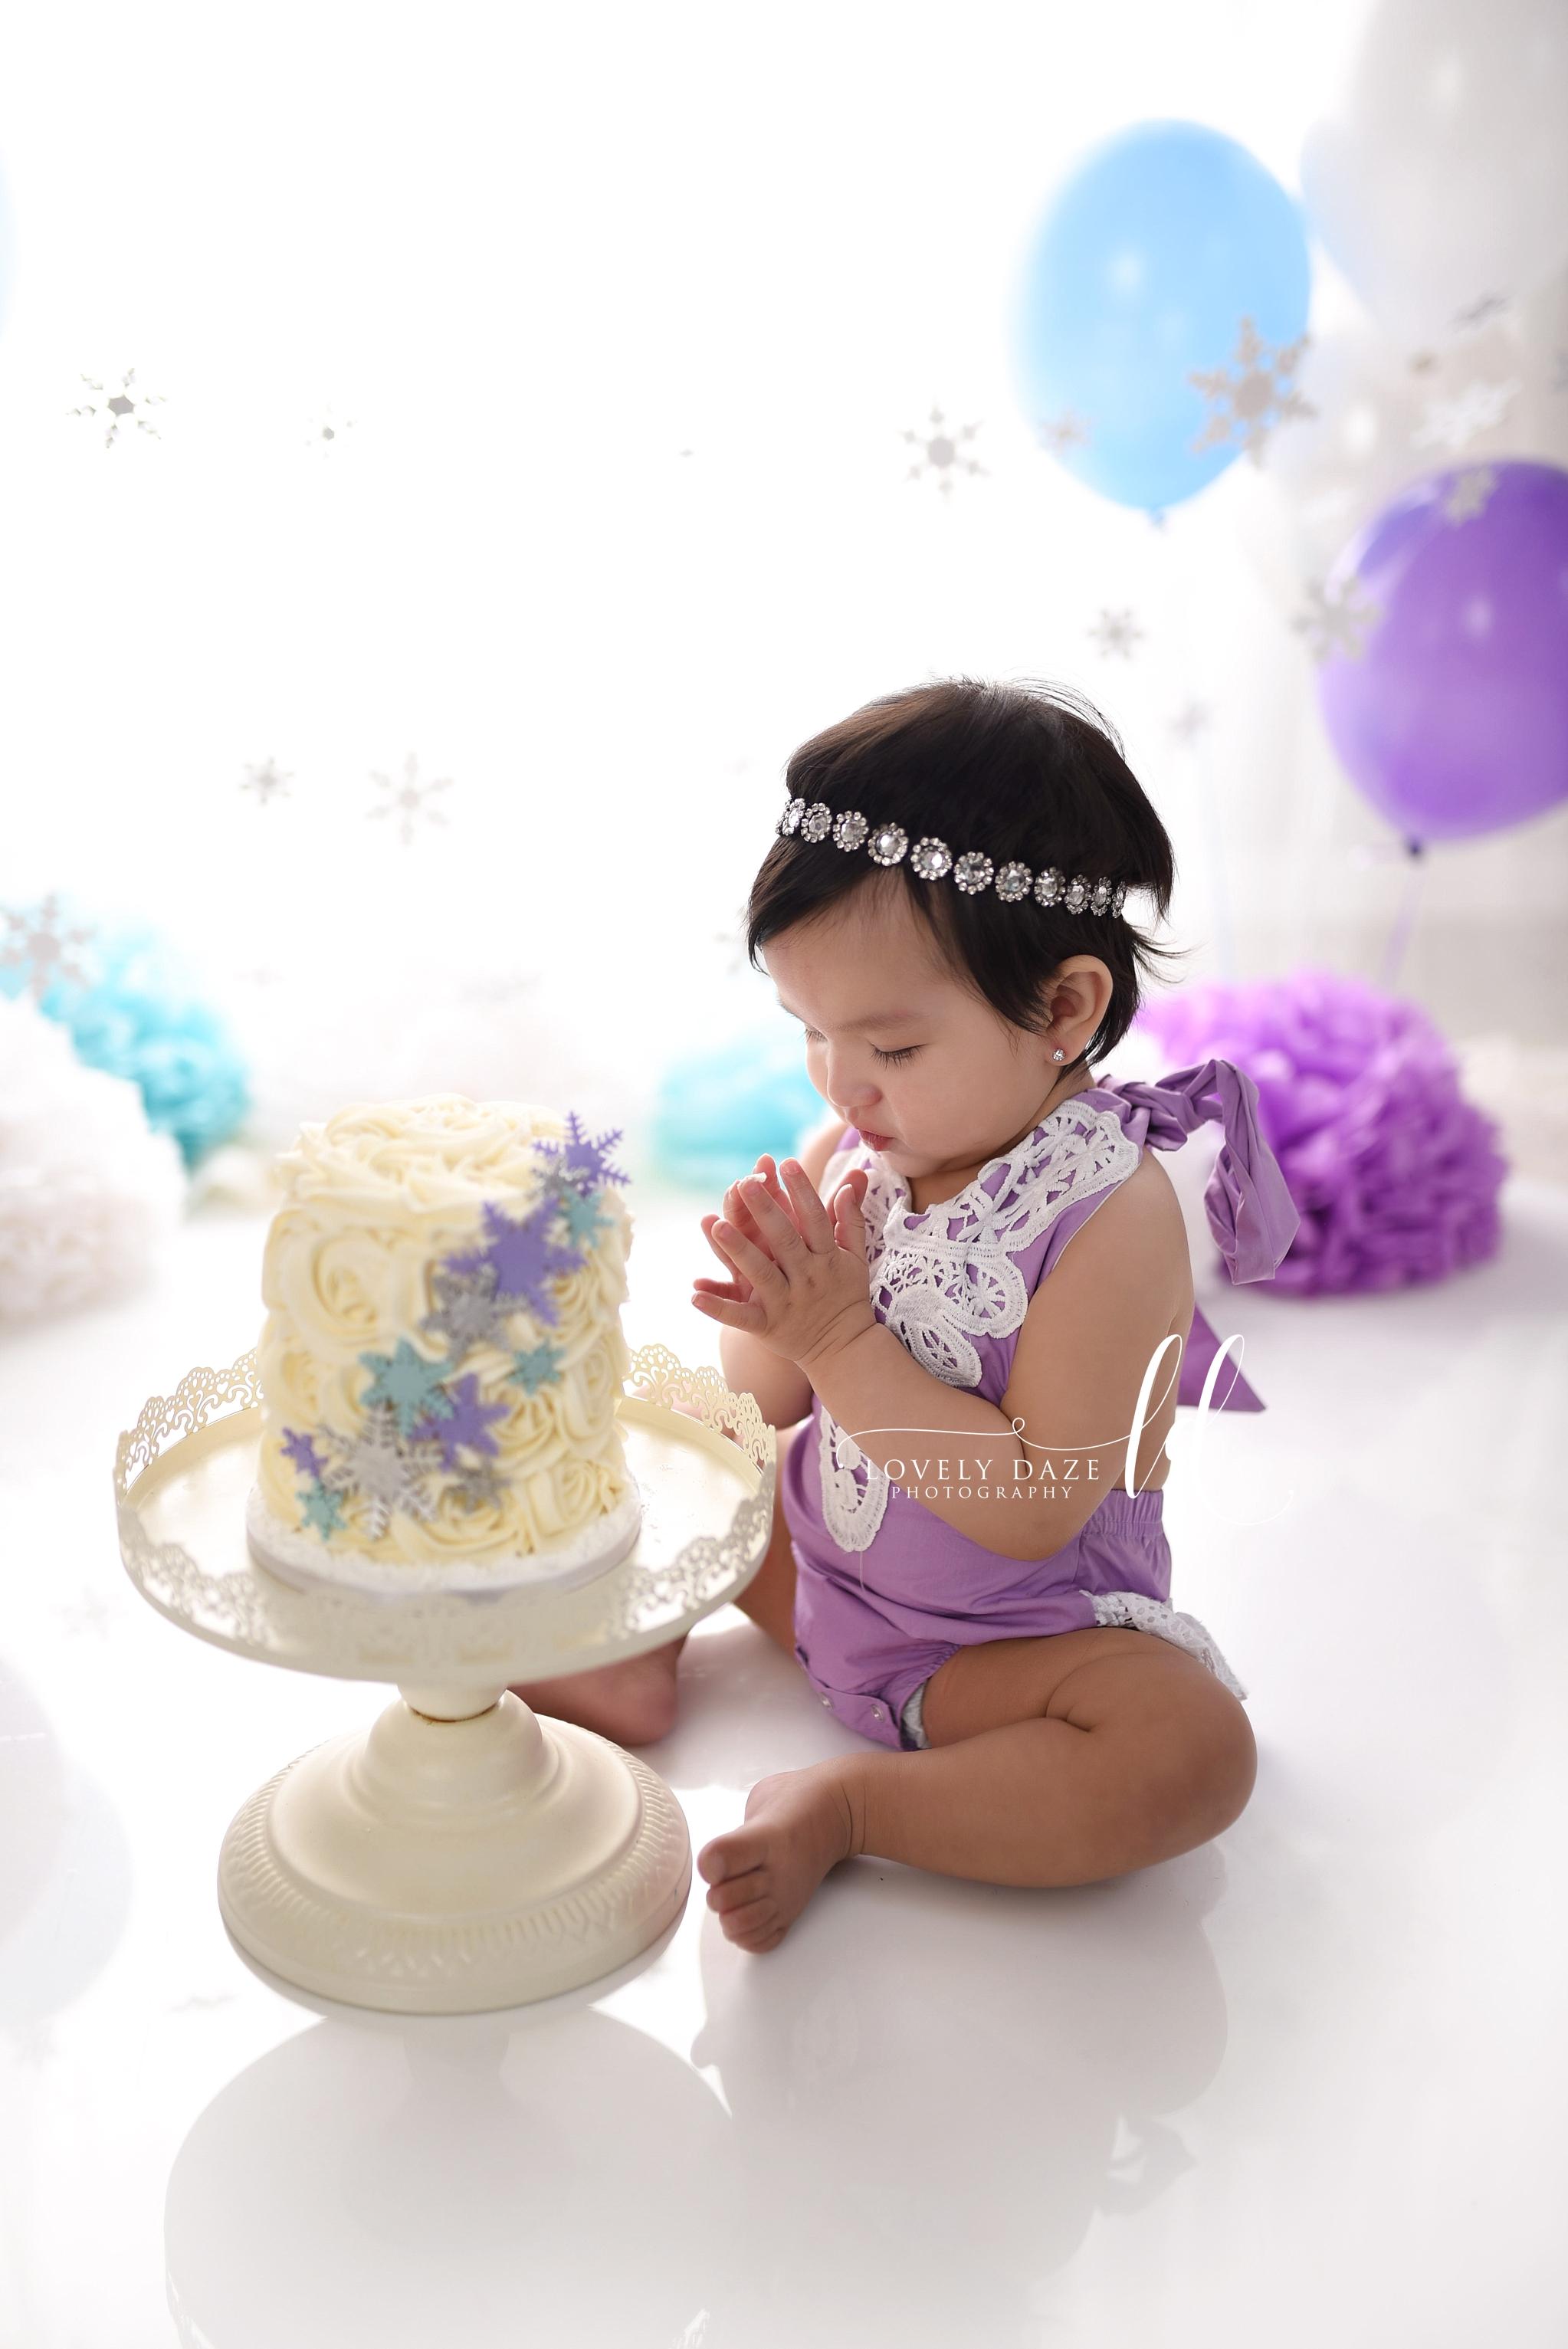 nj cake smash photographer lovely daze  baby photographer 37.jpg